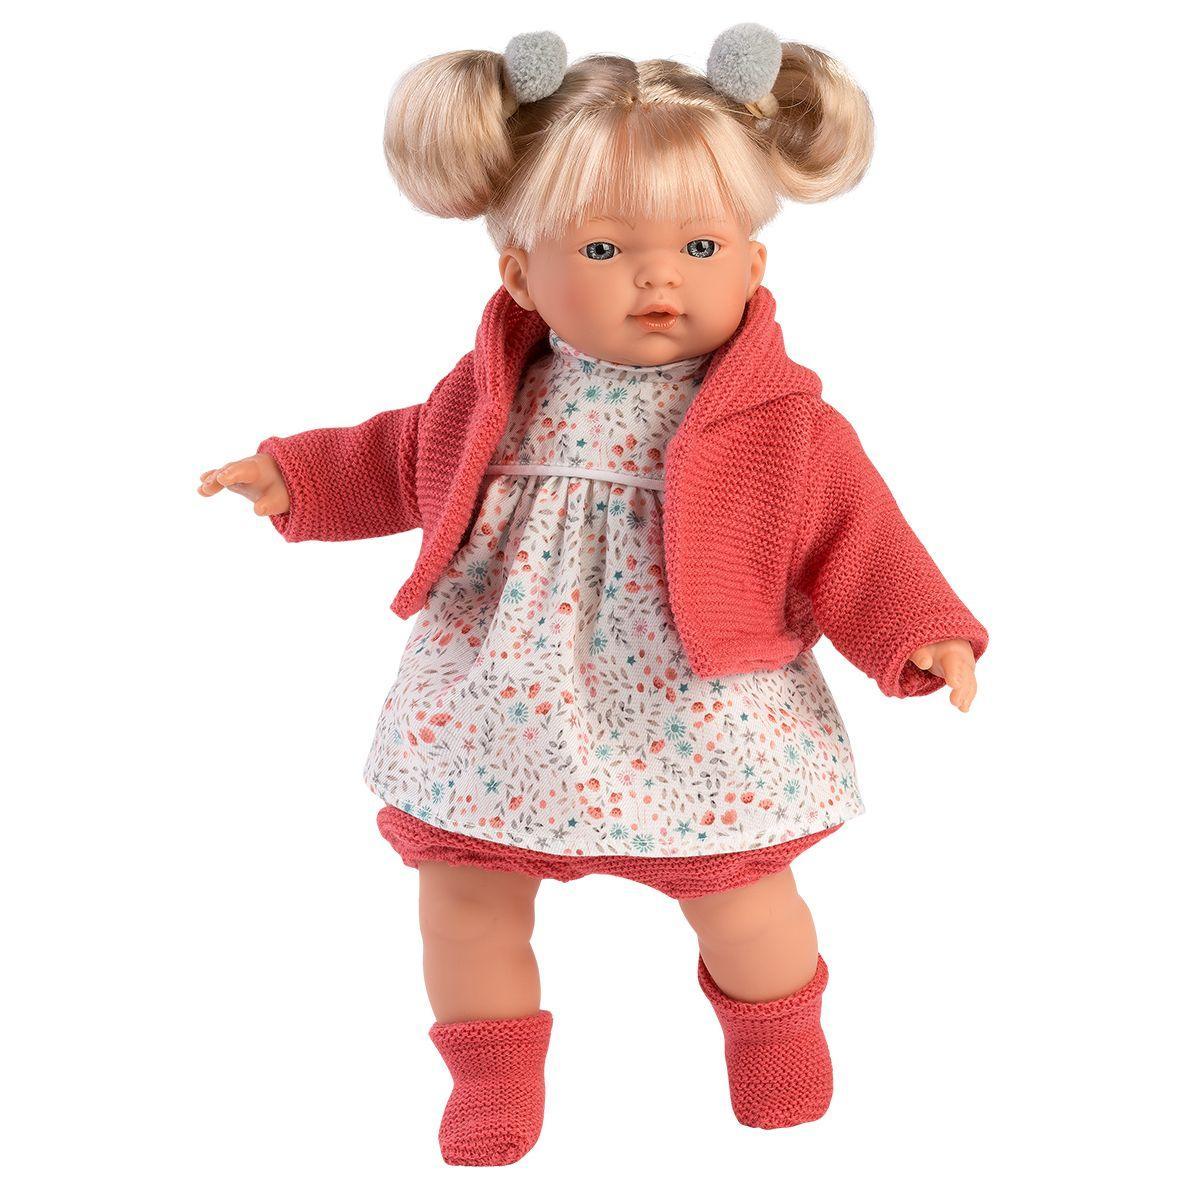 Интерактивная плачущая кукла, 33см, Айтана, Llorens 33124